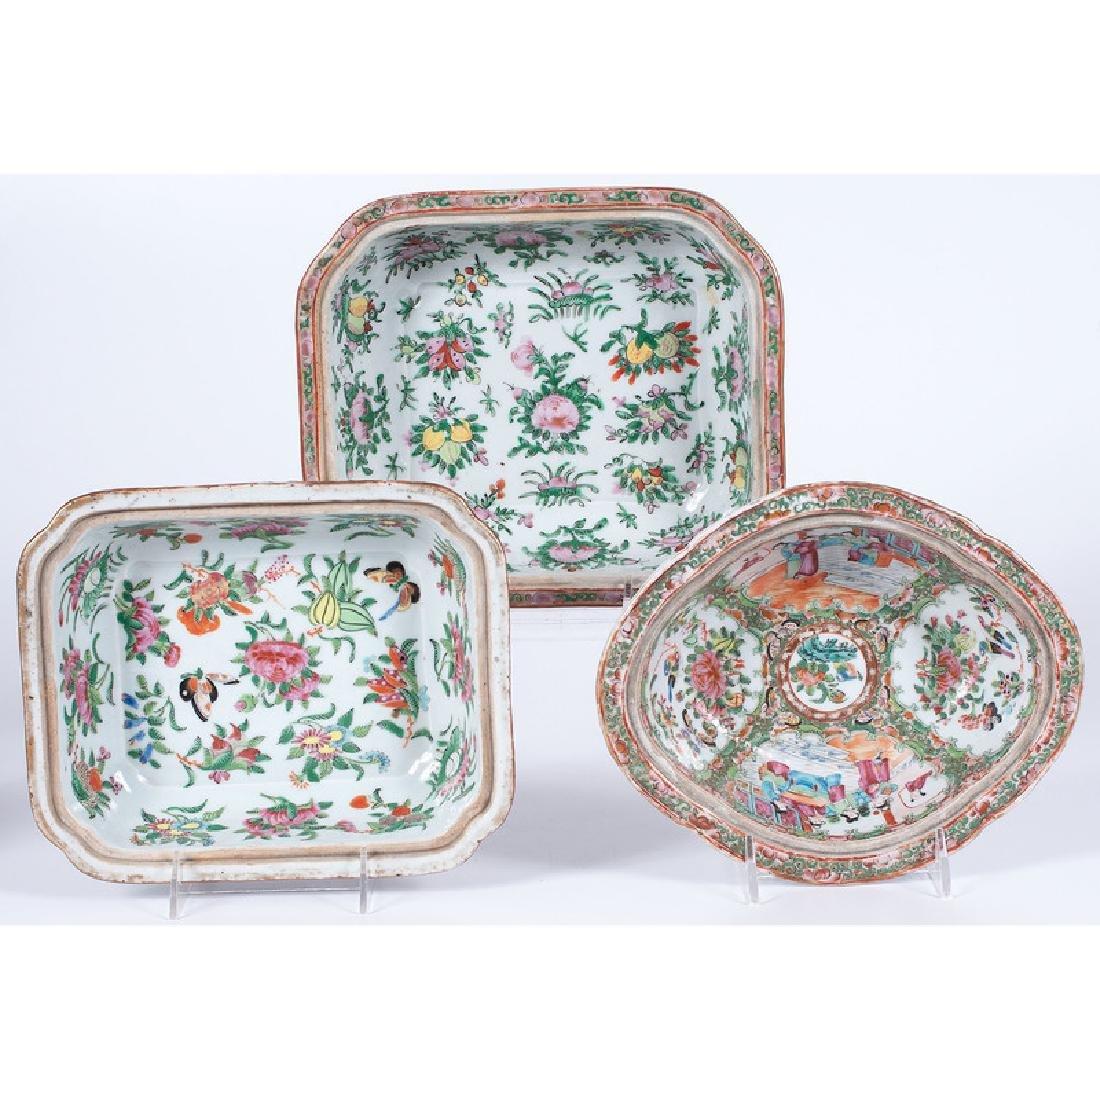 Rose Medallion China Wares - 2